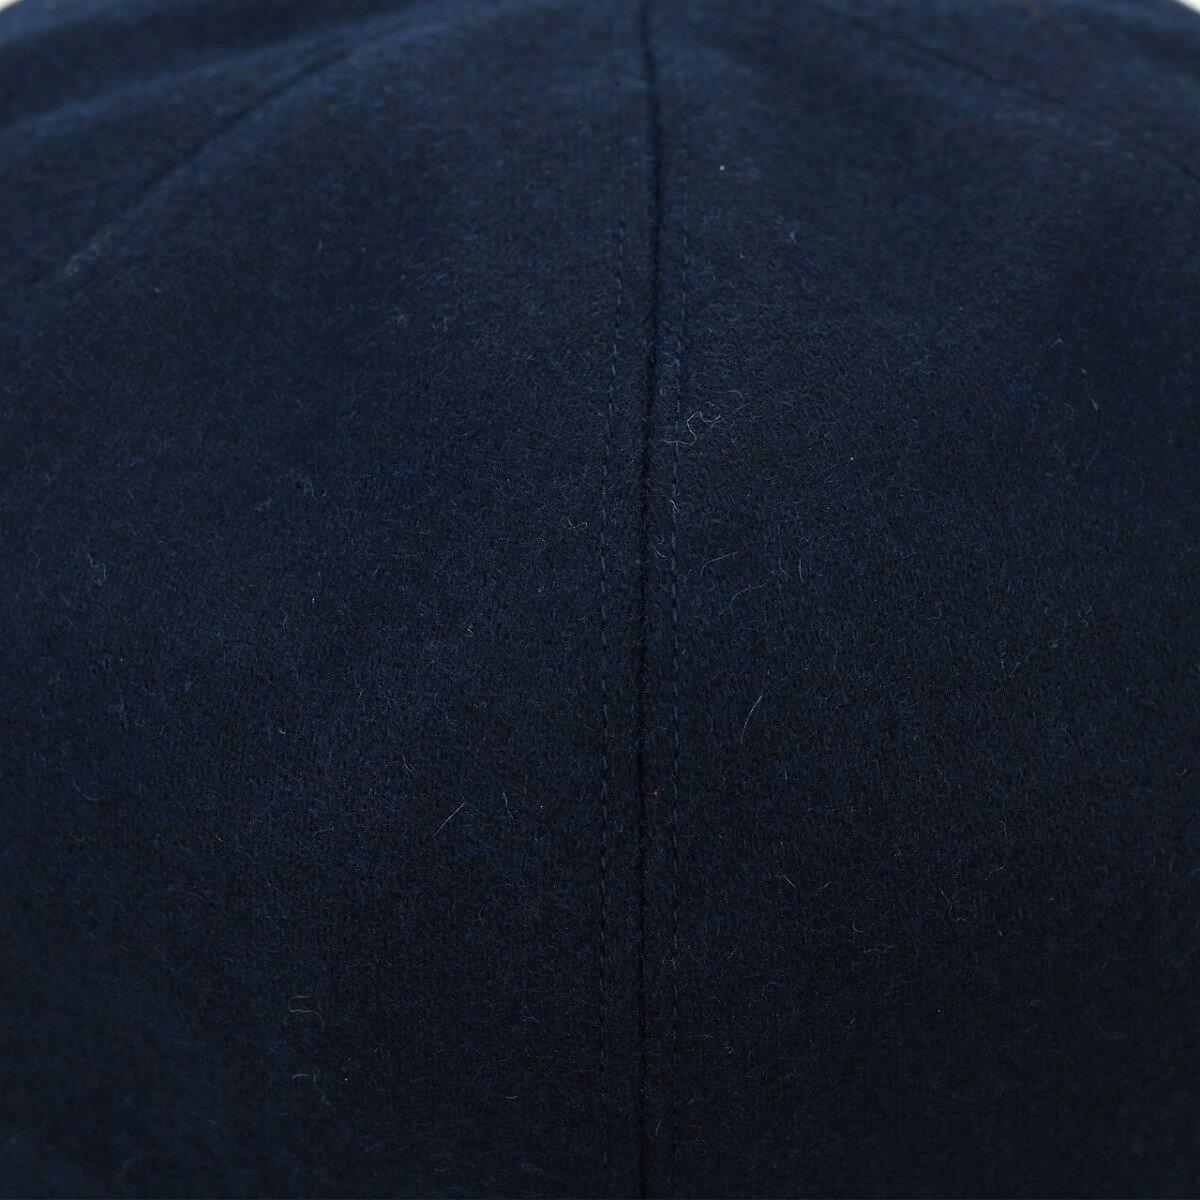 racal ベレー帽 8パネル 秋冬 ラカル ウール ベレー メンズ ブランド 国産 帽子 日本製 フリーサイズ ゴムアジャスター付 サイズ調整 ベレー レディース 無地 シンプル トレンド 小物 ファッション メンズコーデ / 紺 ネイビー [ beret ]